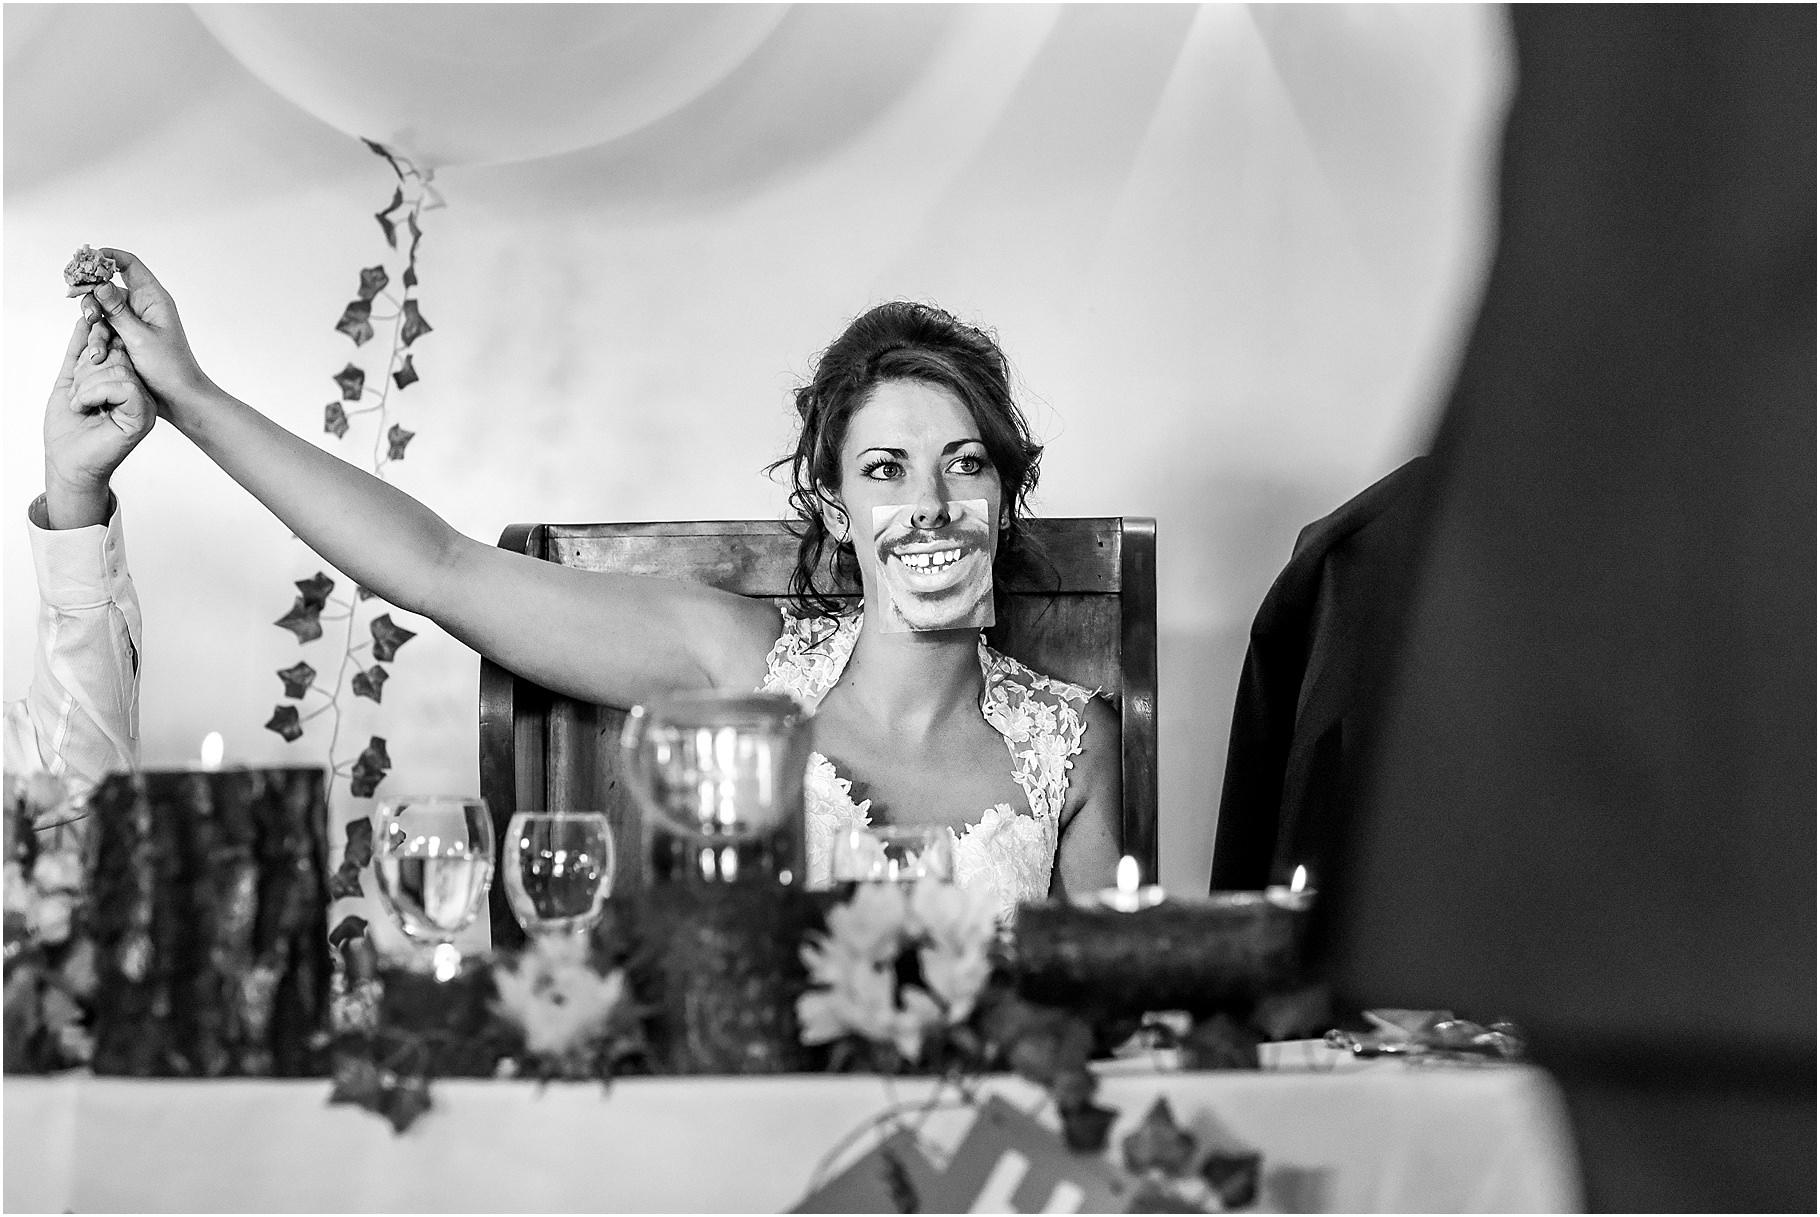 dan-wootton-photography-2017-weddings-186.jpg